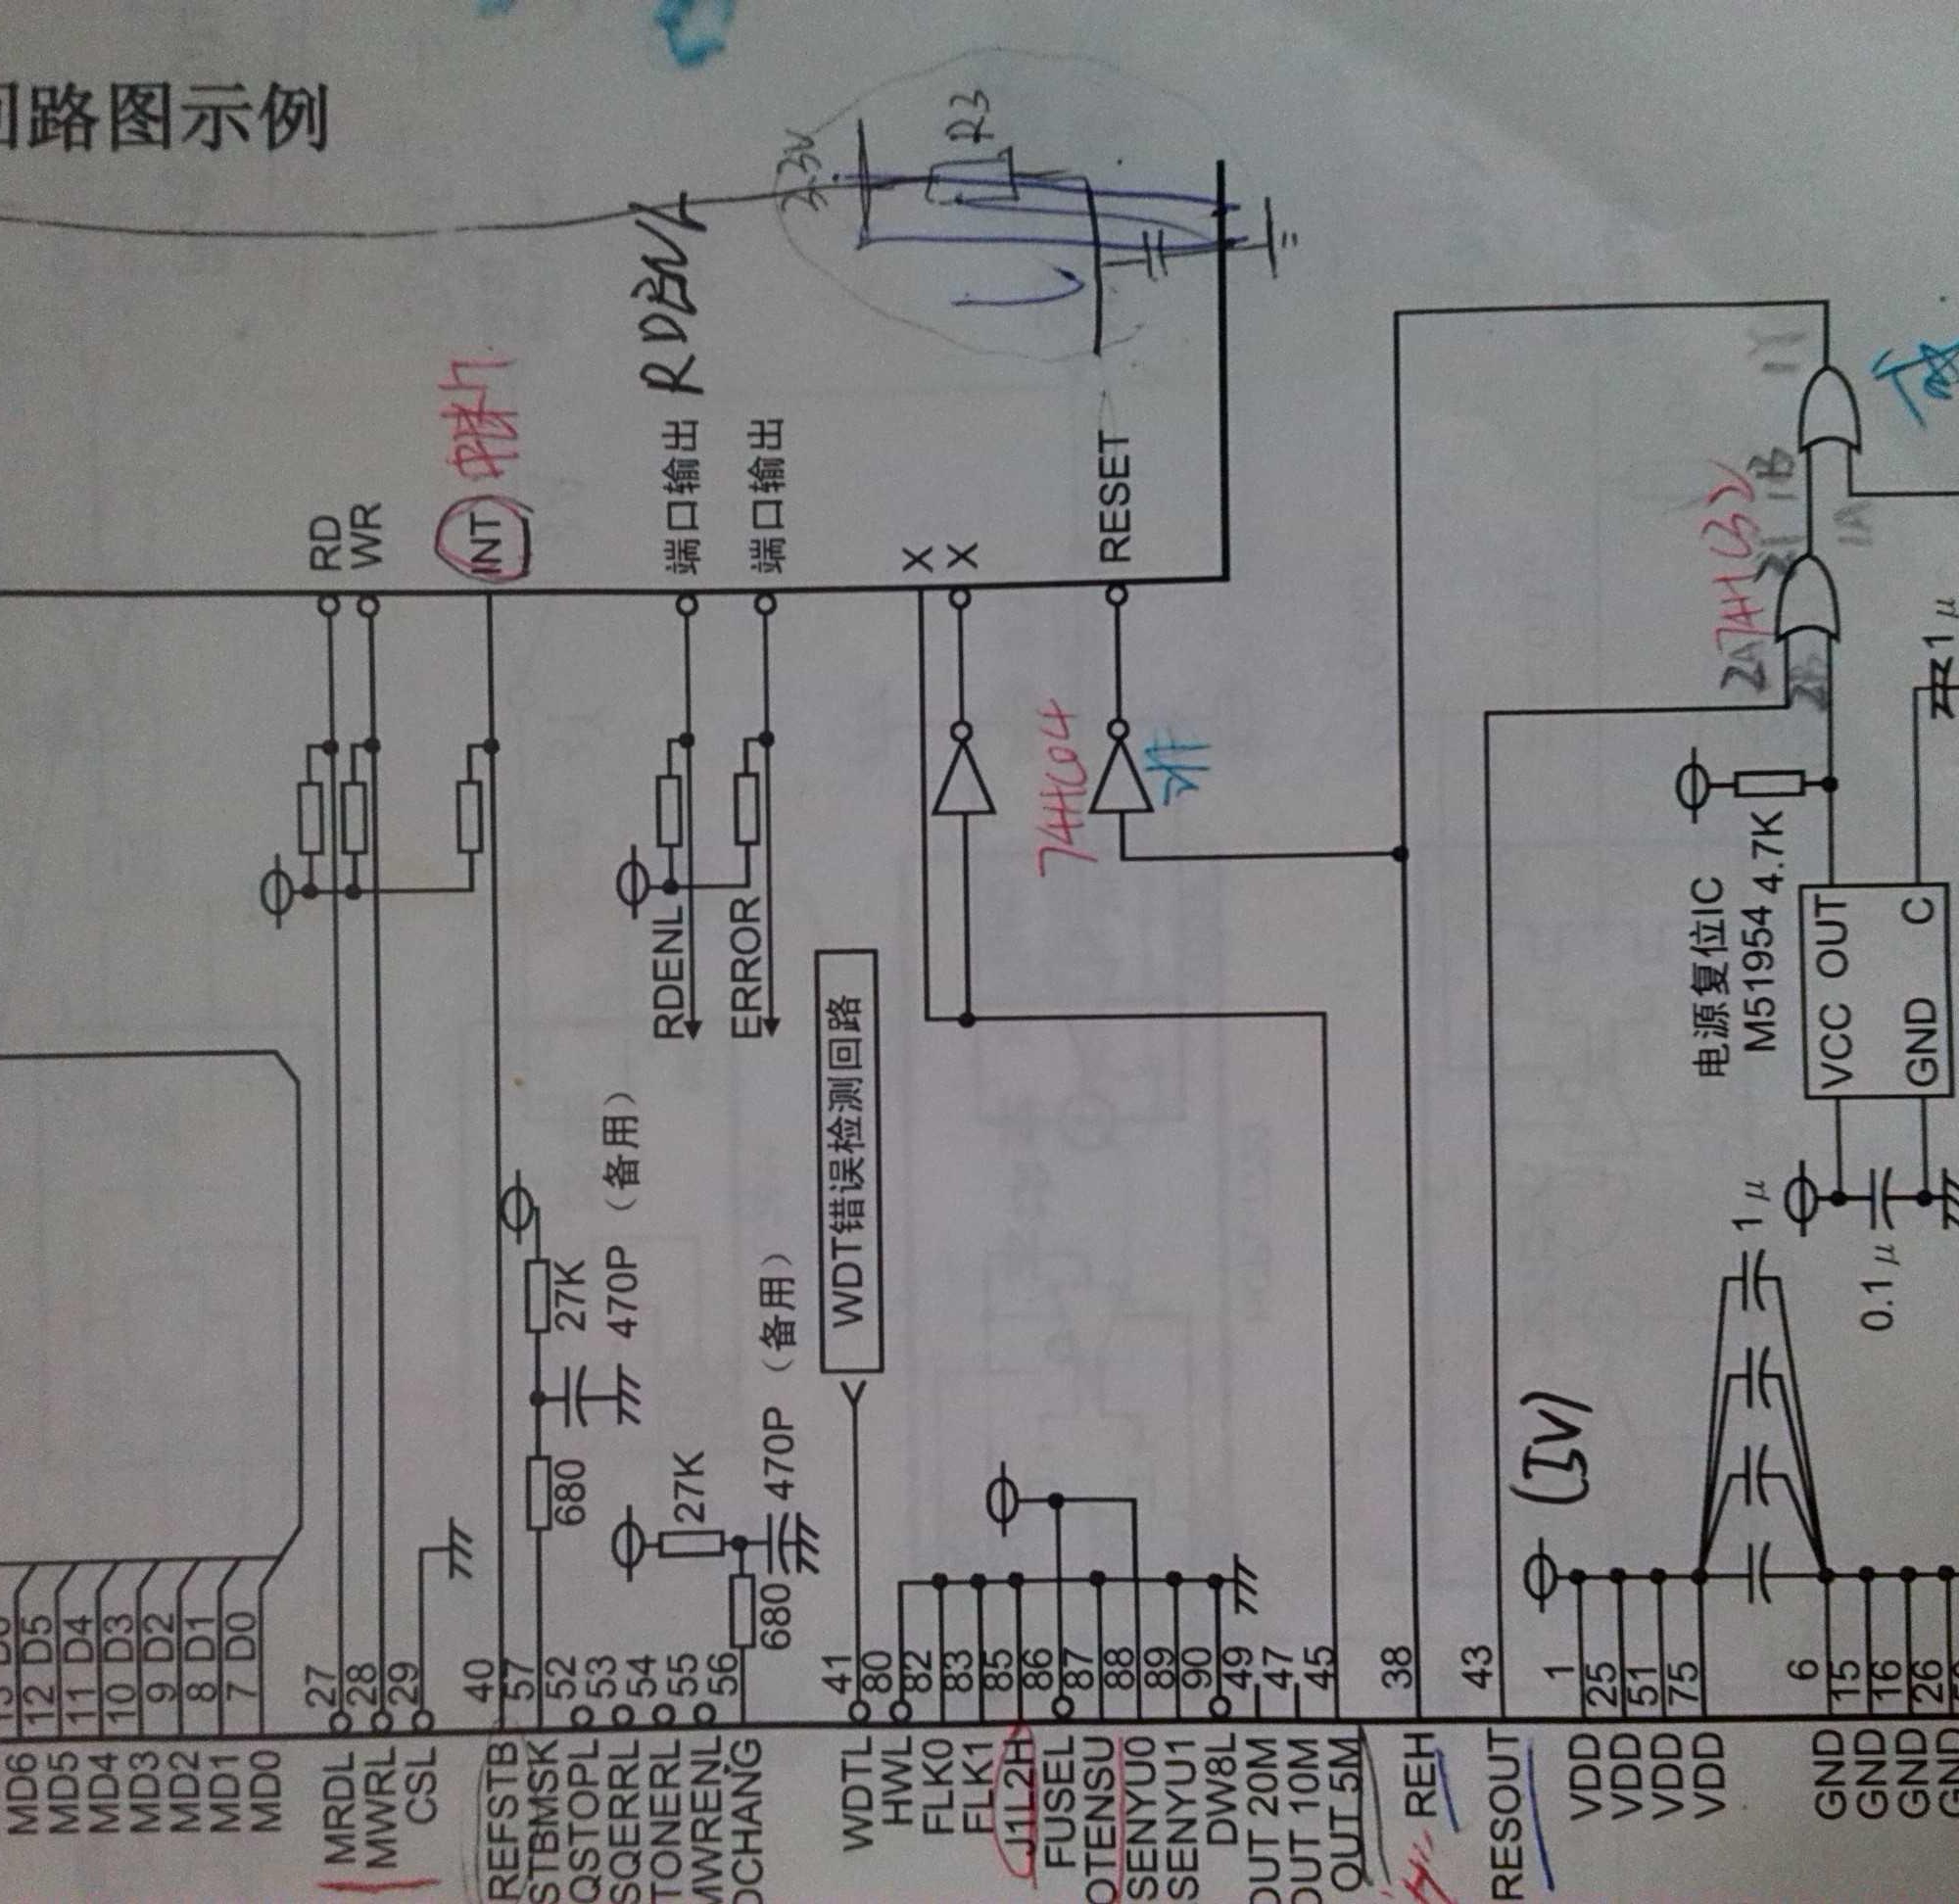 3v的stm32f103r8t6和另5v协议芯片的两个引脚构成远程按键复位电路